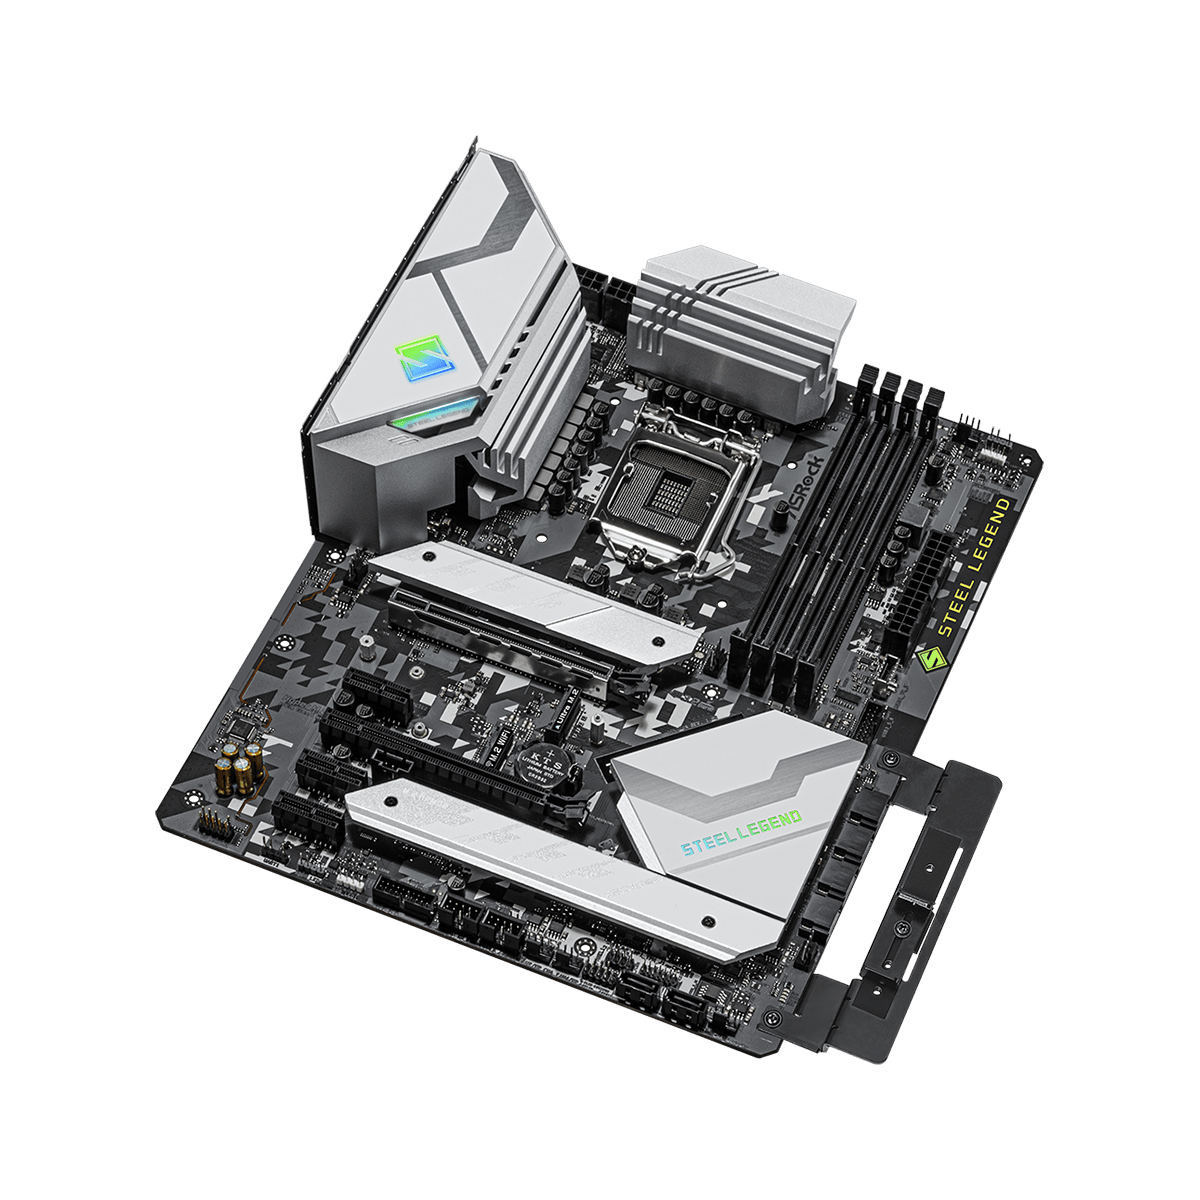 Placa Mãe ASRock Z590 Steel Legend, Chipset Intel Z590, Socket Intel 1200, ATX, DDR4